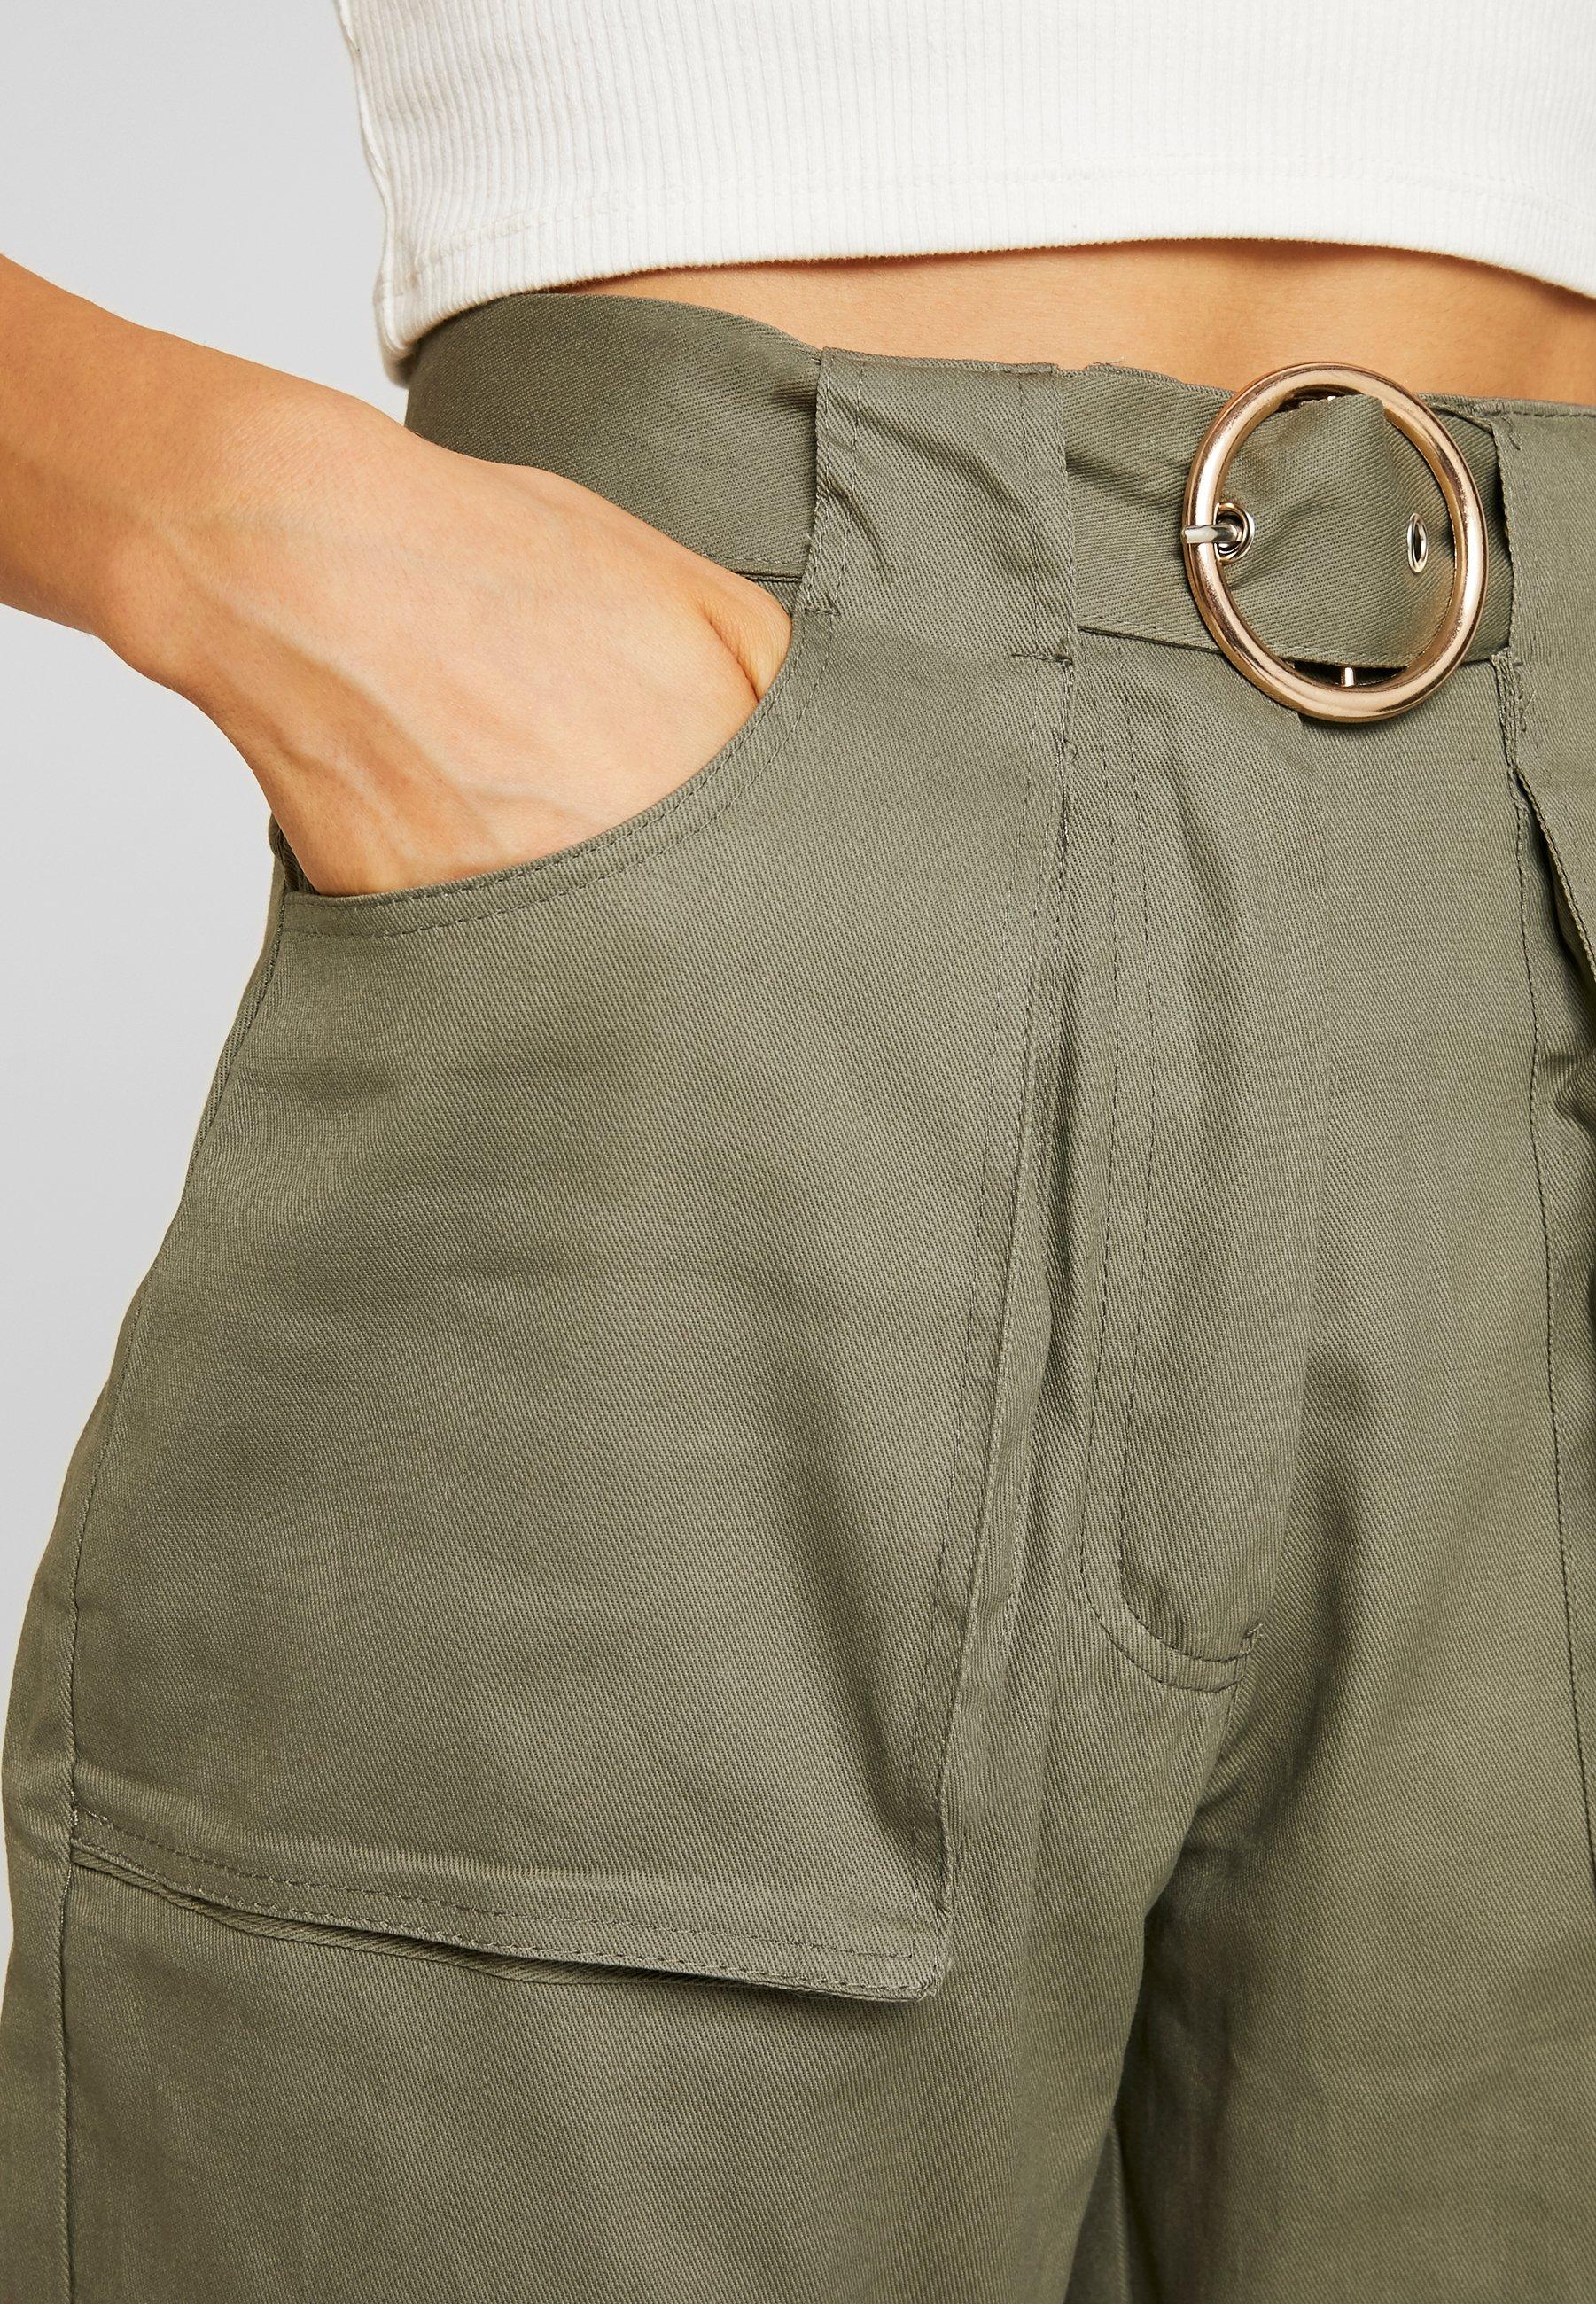 Belt CigarettePantaloni Missguided Circle Pocket Khaki qzVUMSp